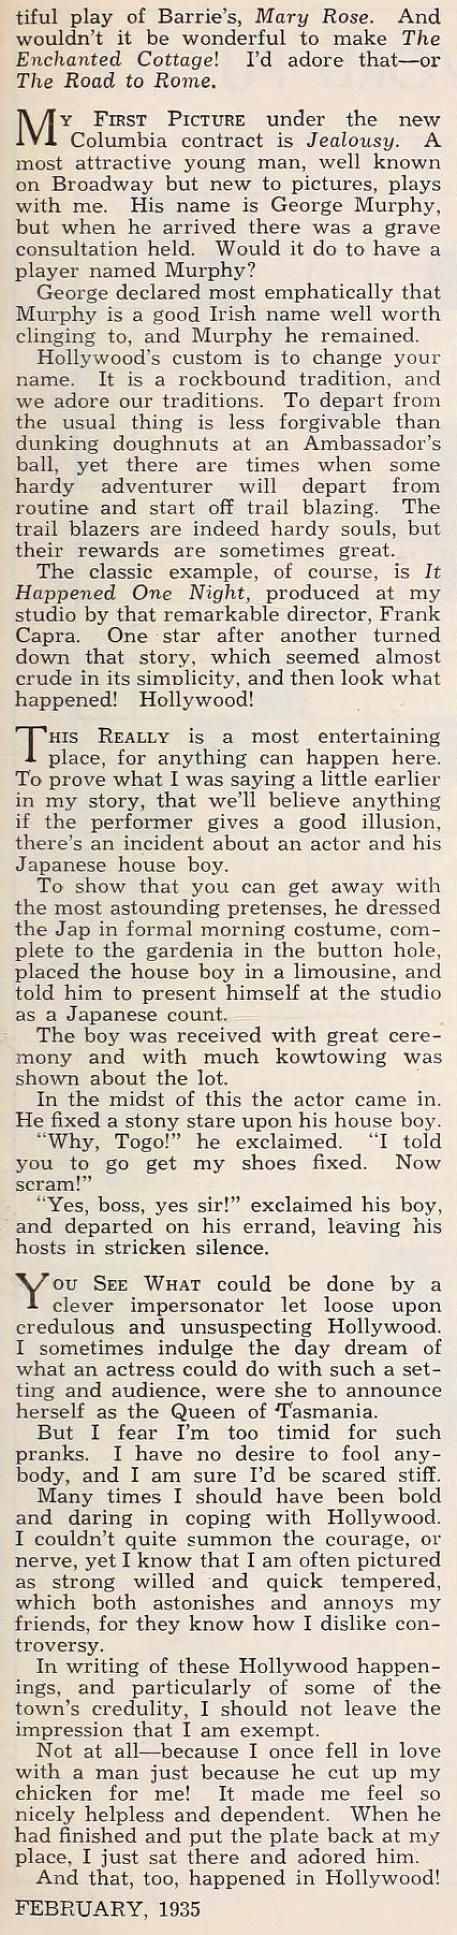 nancy carroll hollywood february 1935ca